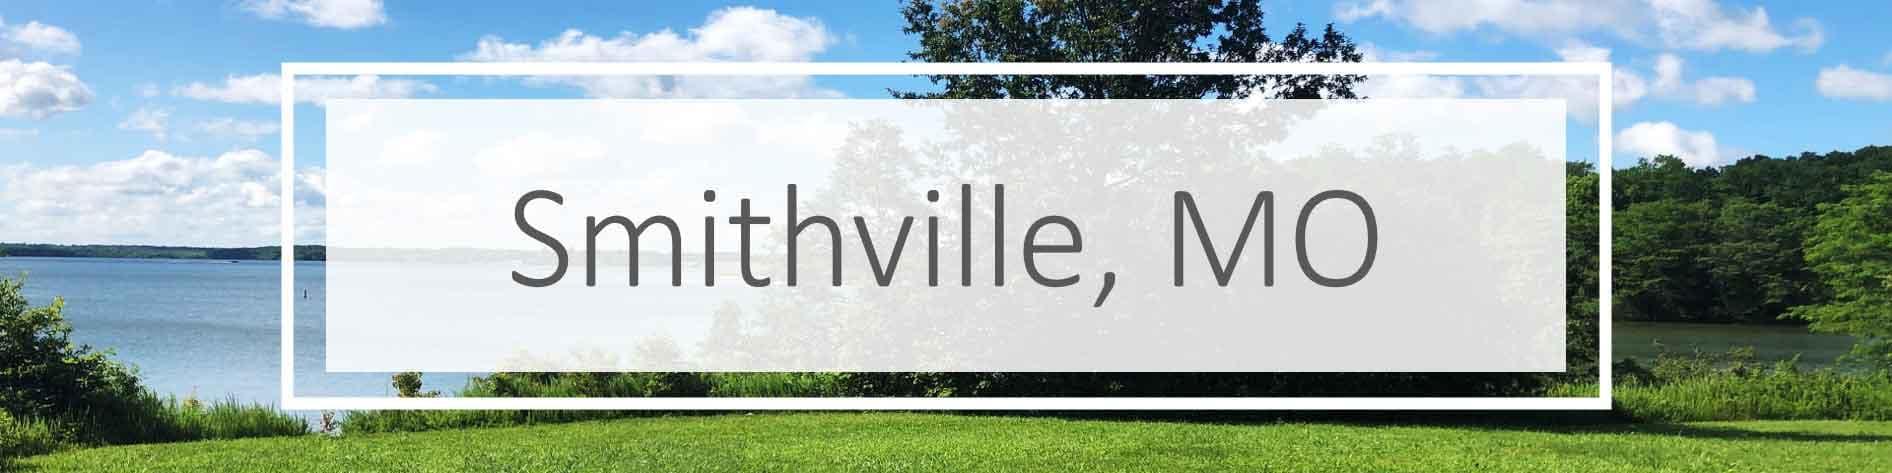 Victory Chevrolet of Smithville Serving Smithville